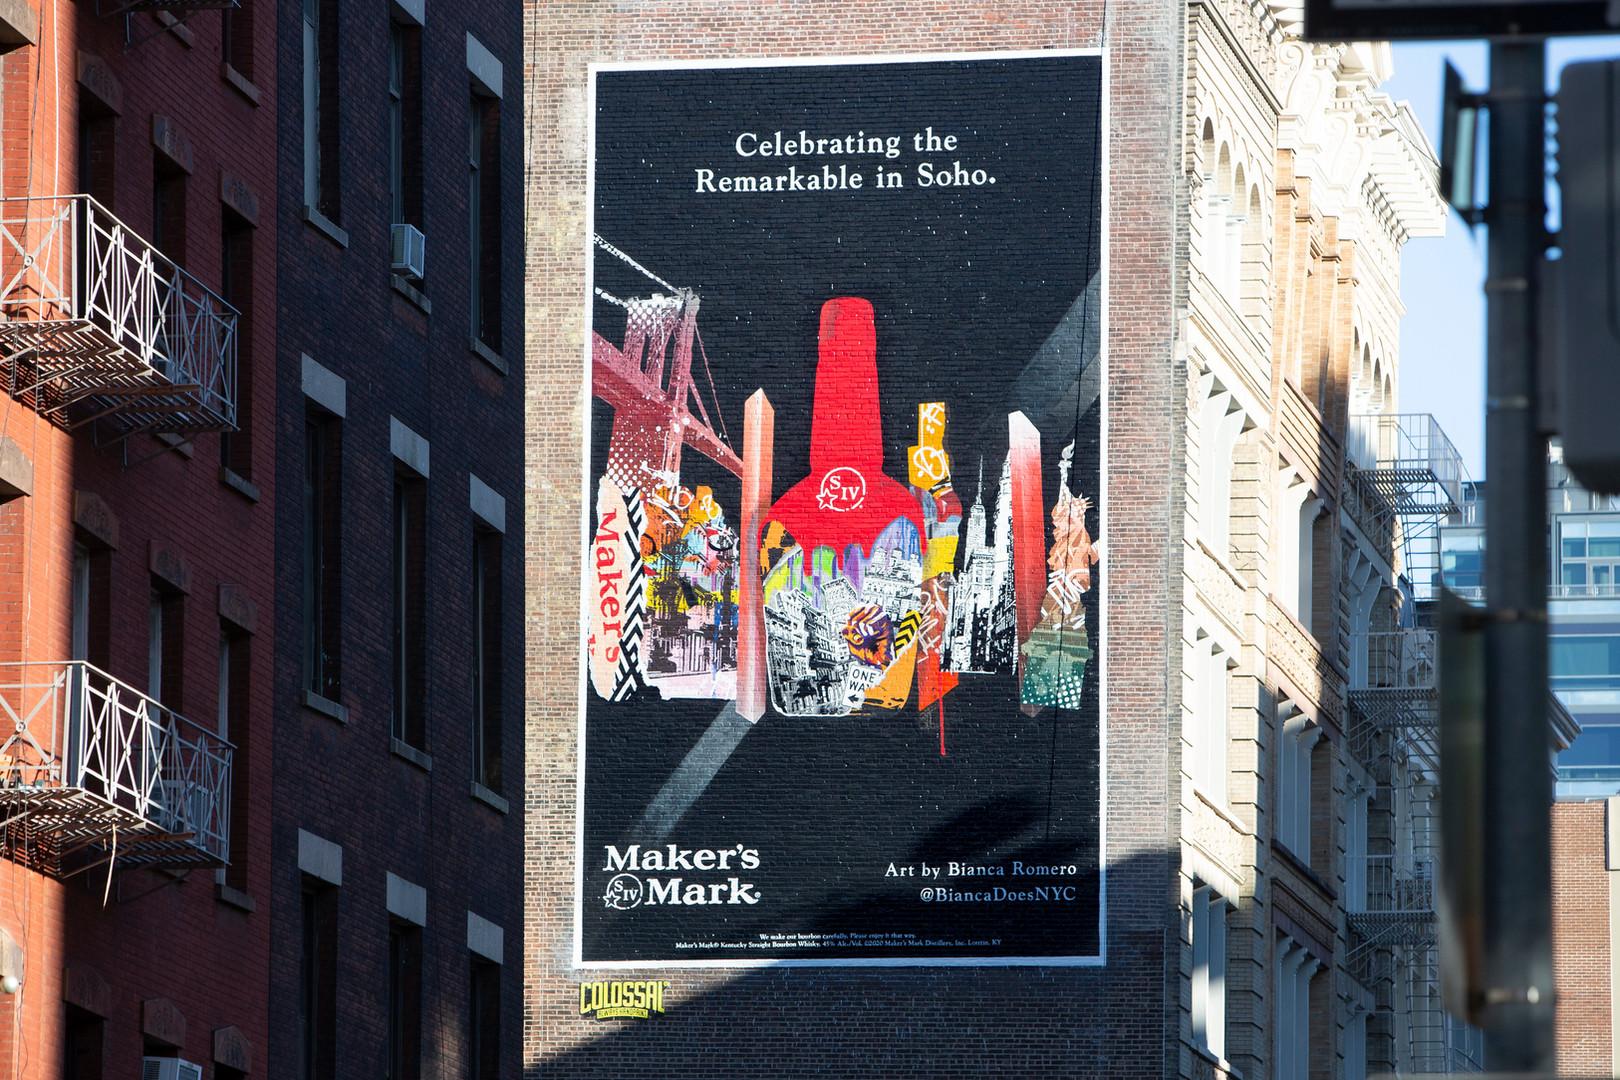 Bianca Romero x Makers Mark brand collaboration